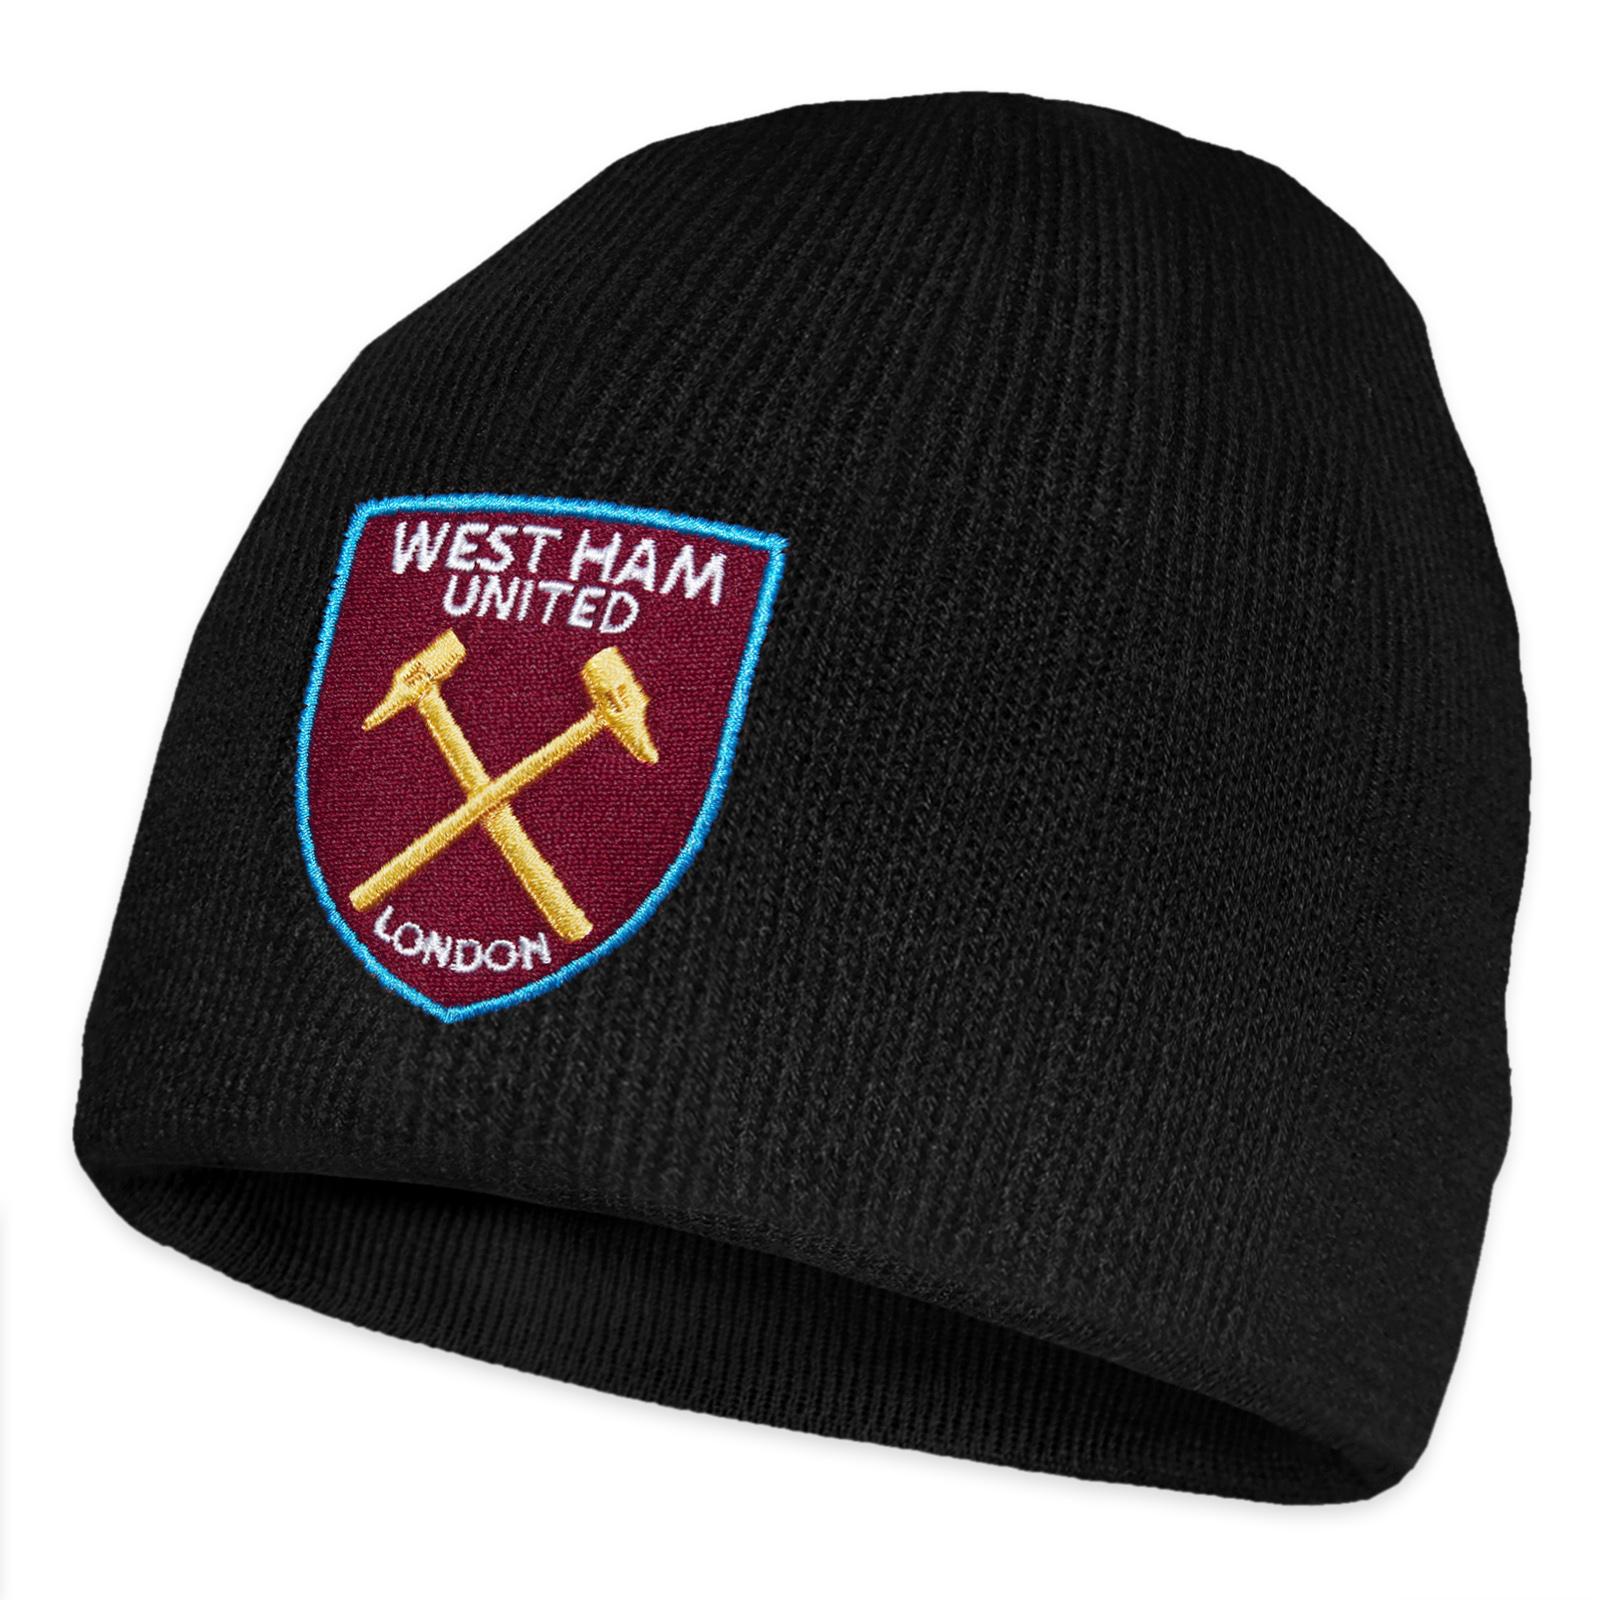 Cappello-originale-West-Ham-FC-in-maglia-idea-regalo